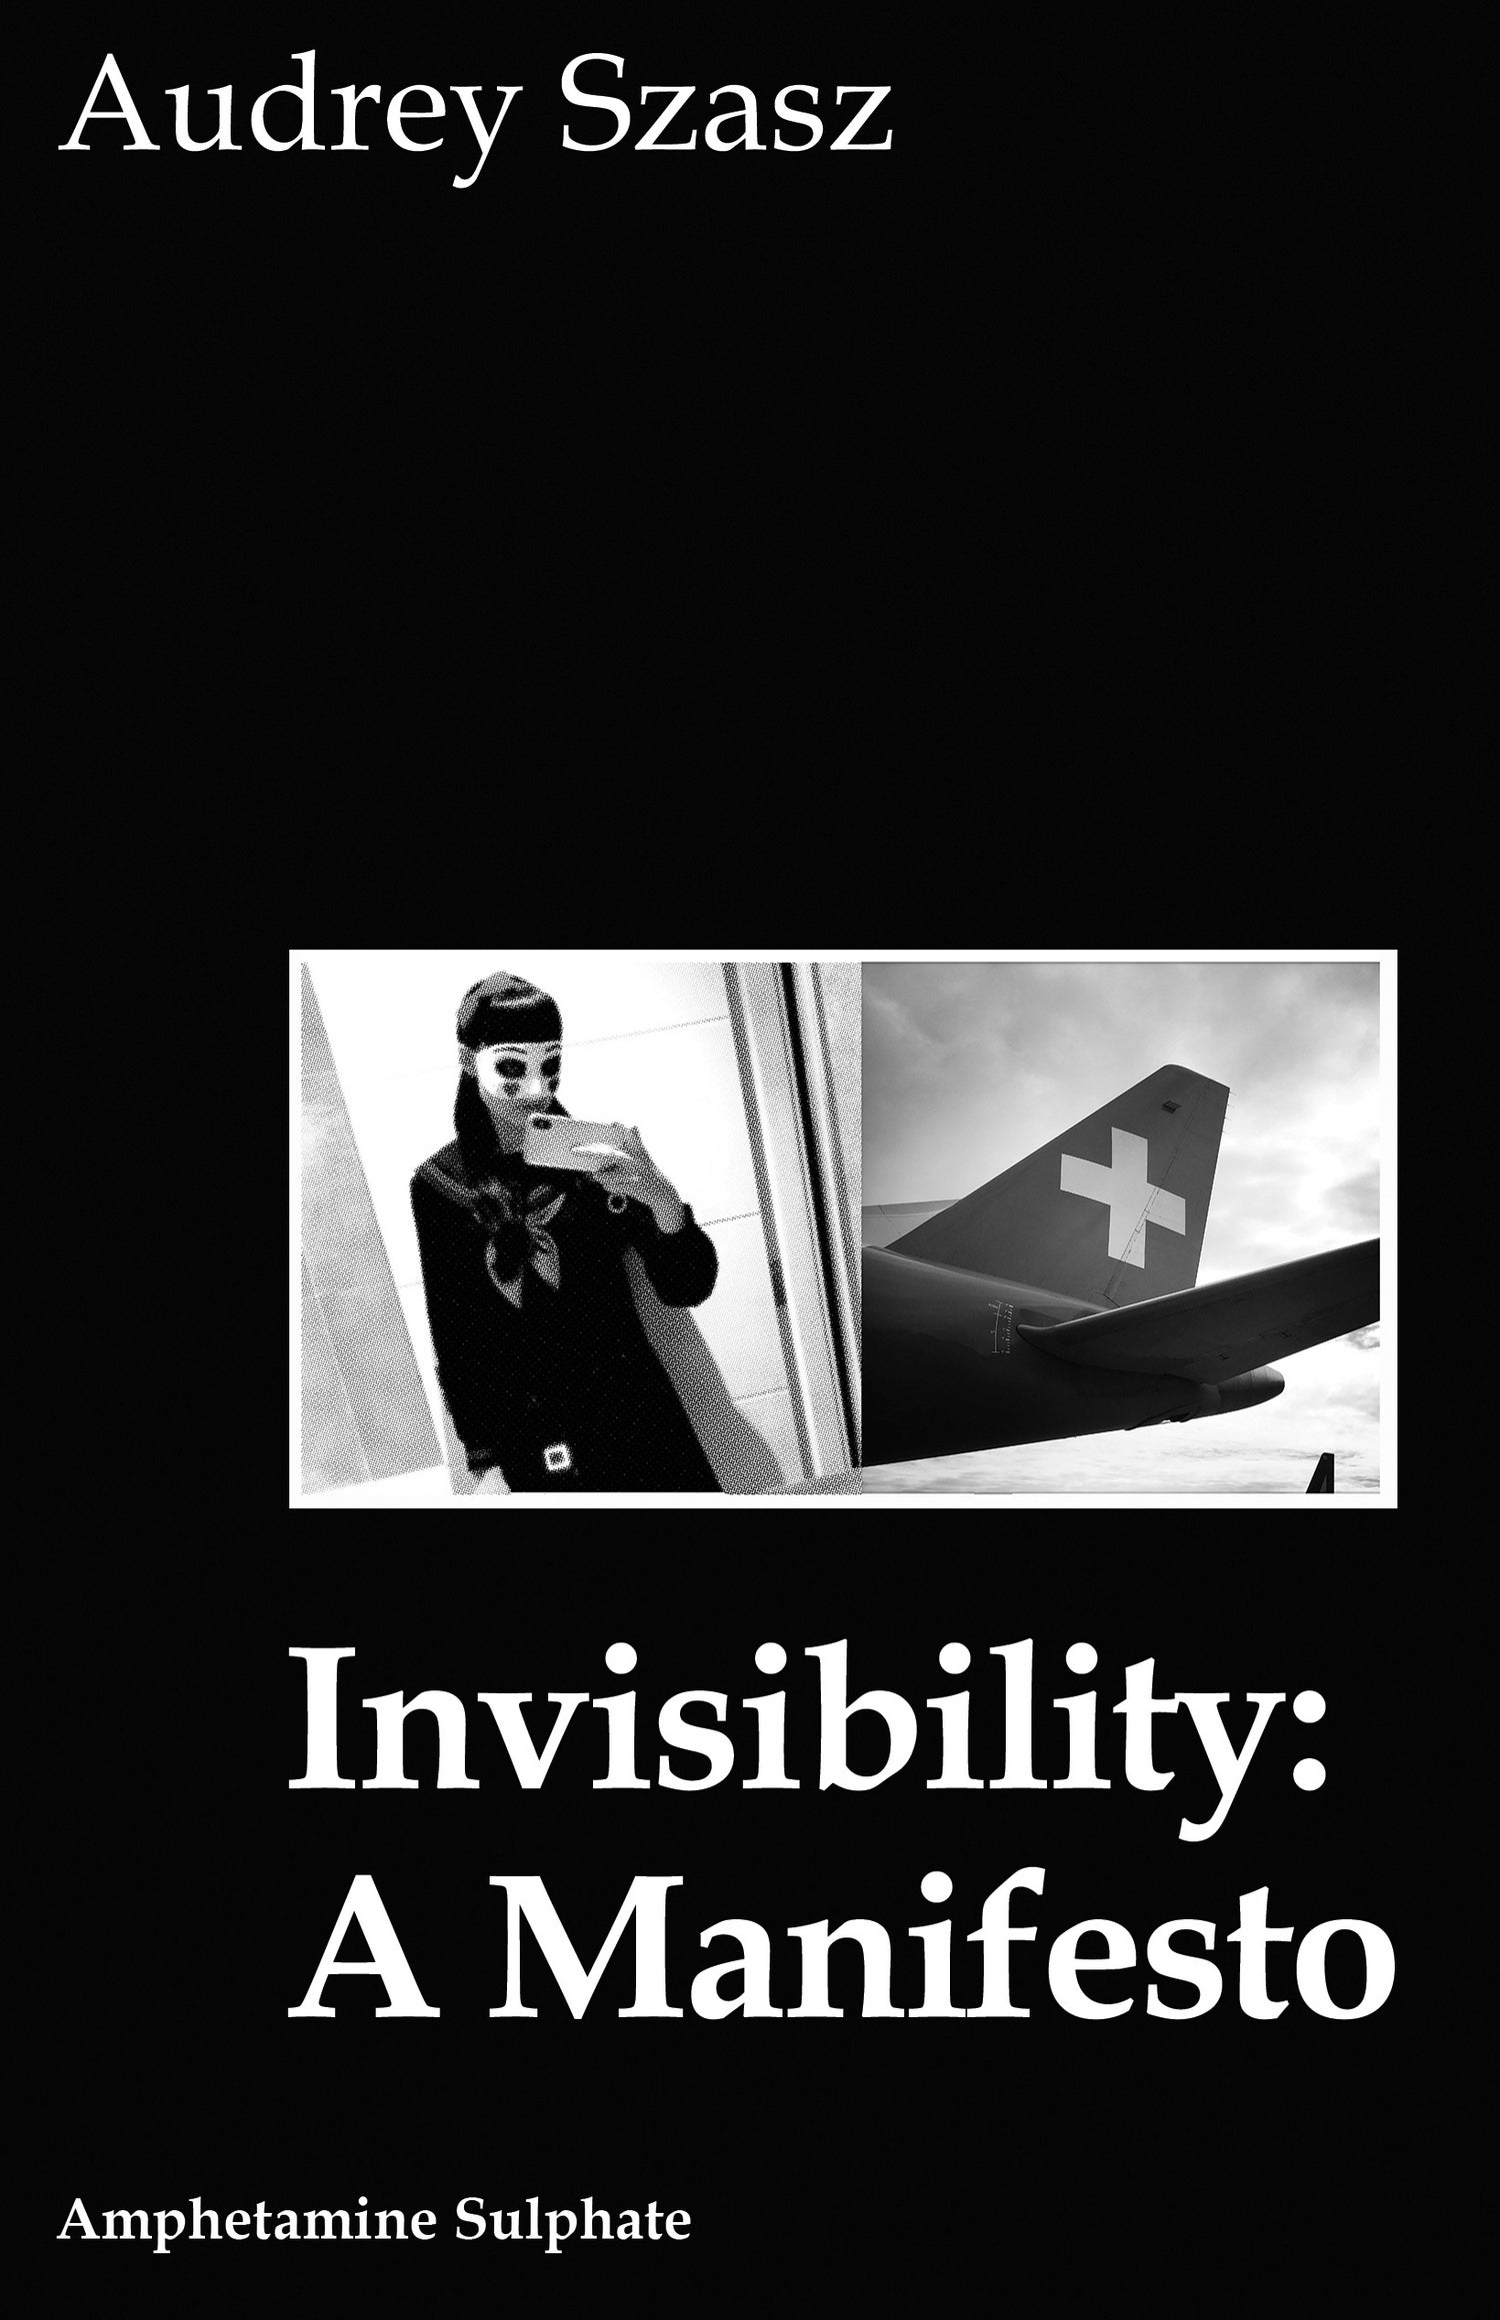 Image of <b>Invisibility: A Manifesto</b> <br>Audrey Szasz